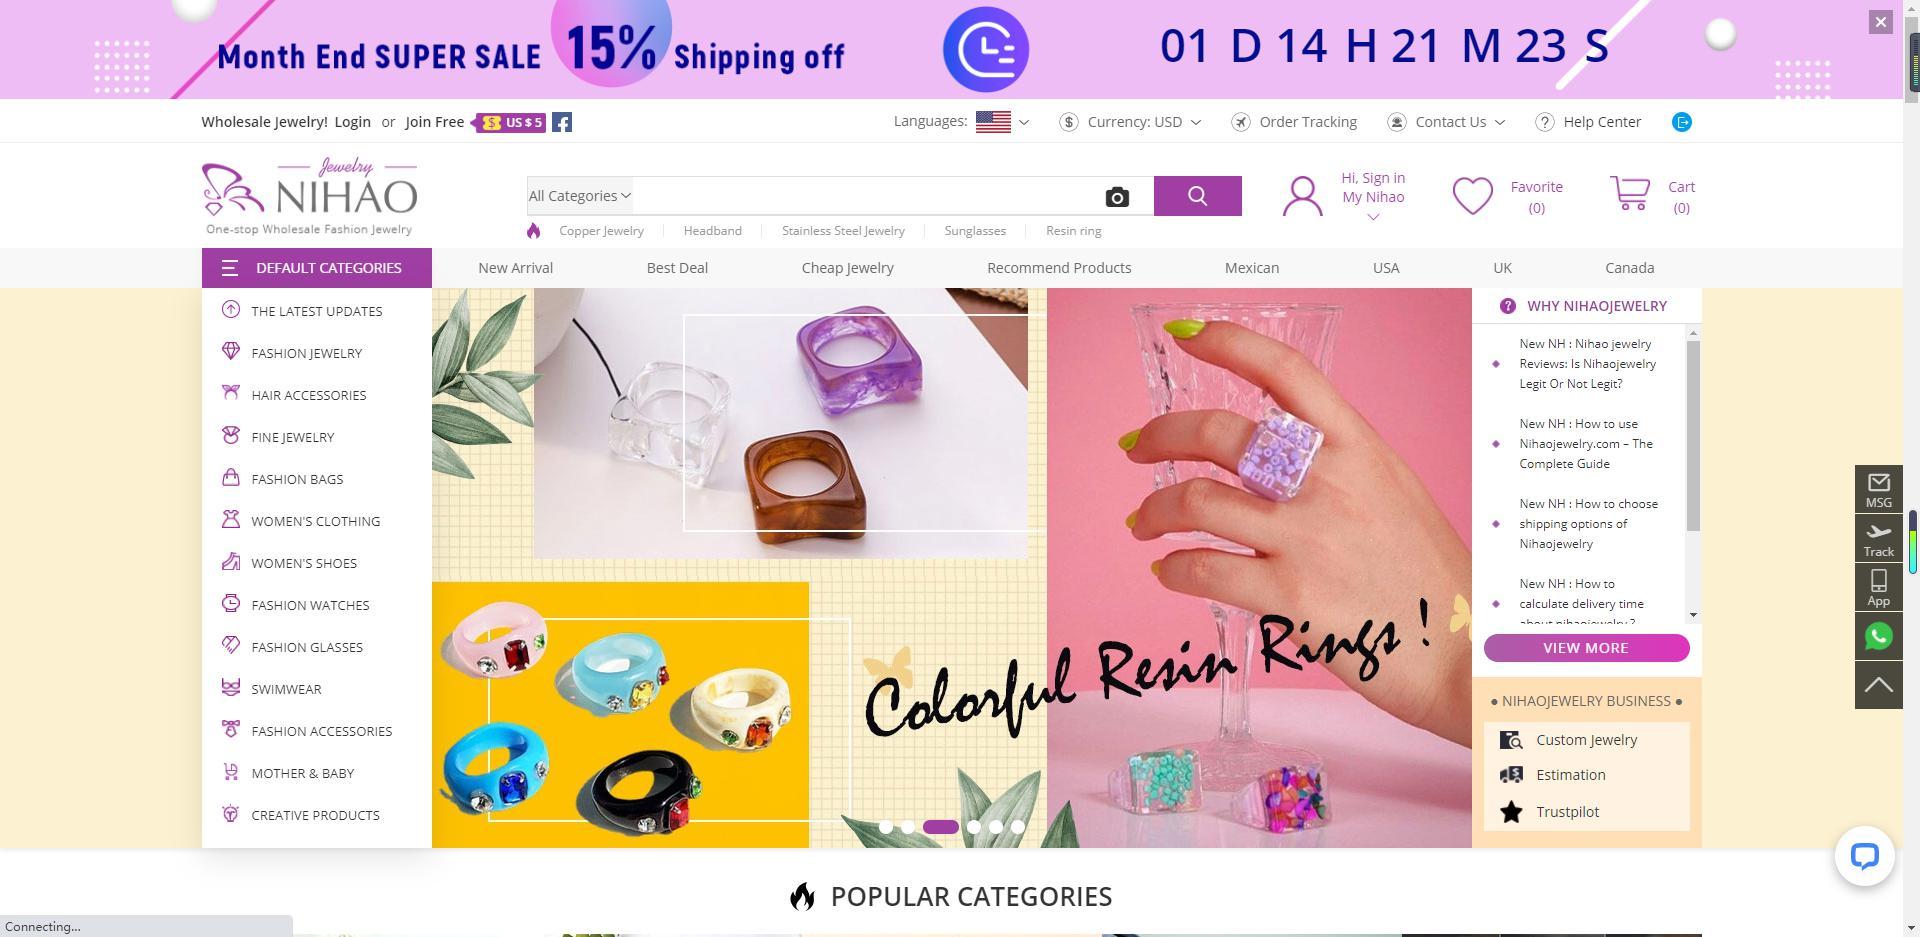 Nihaojewelry homepage- colorful resin rings banner